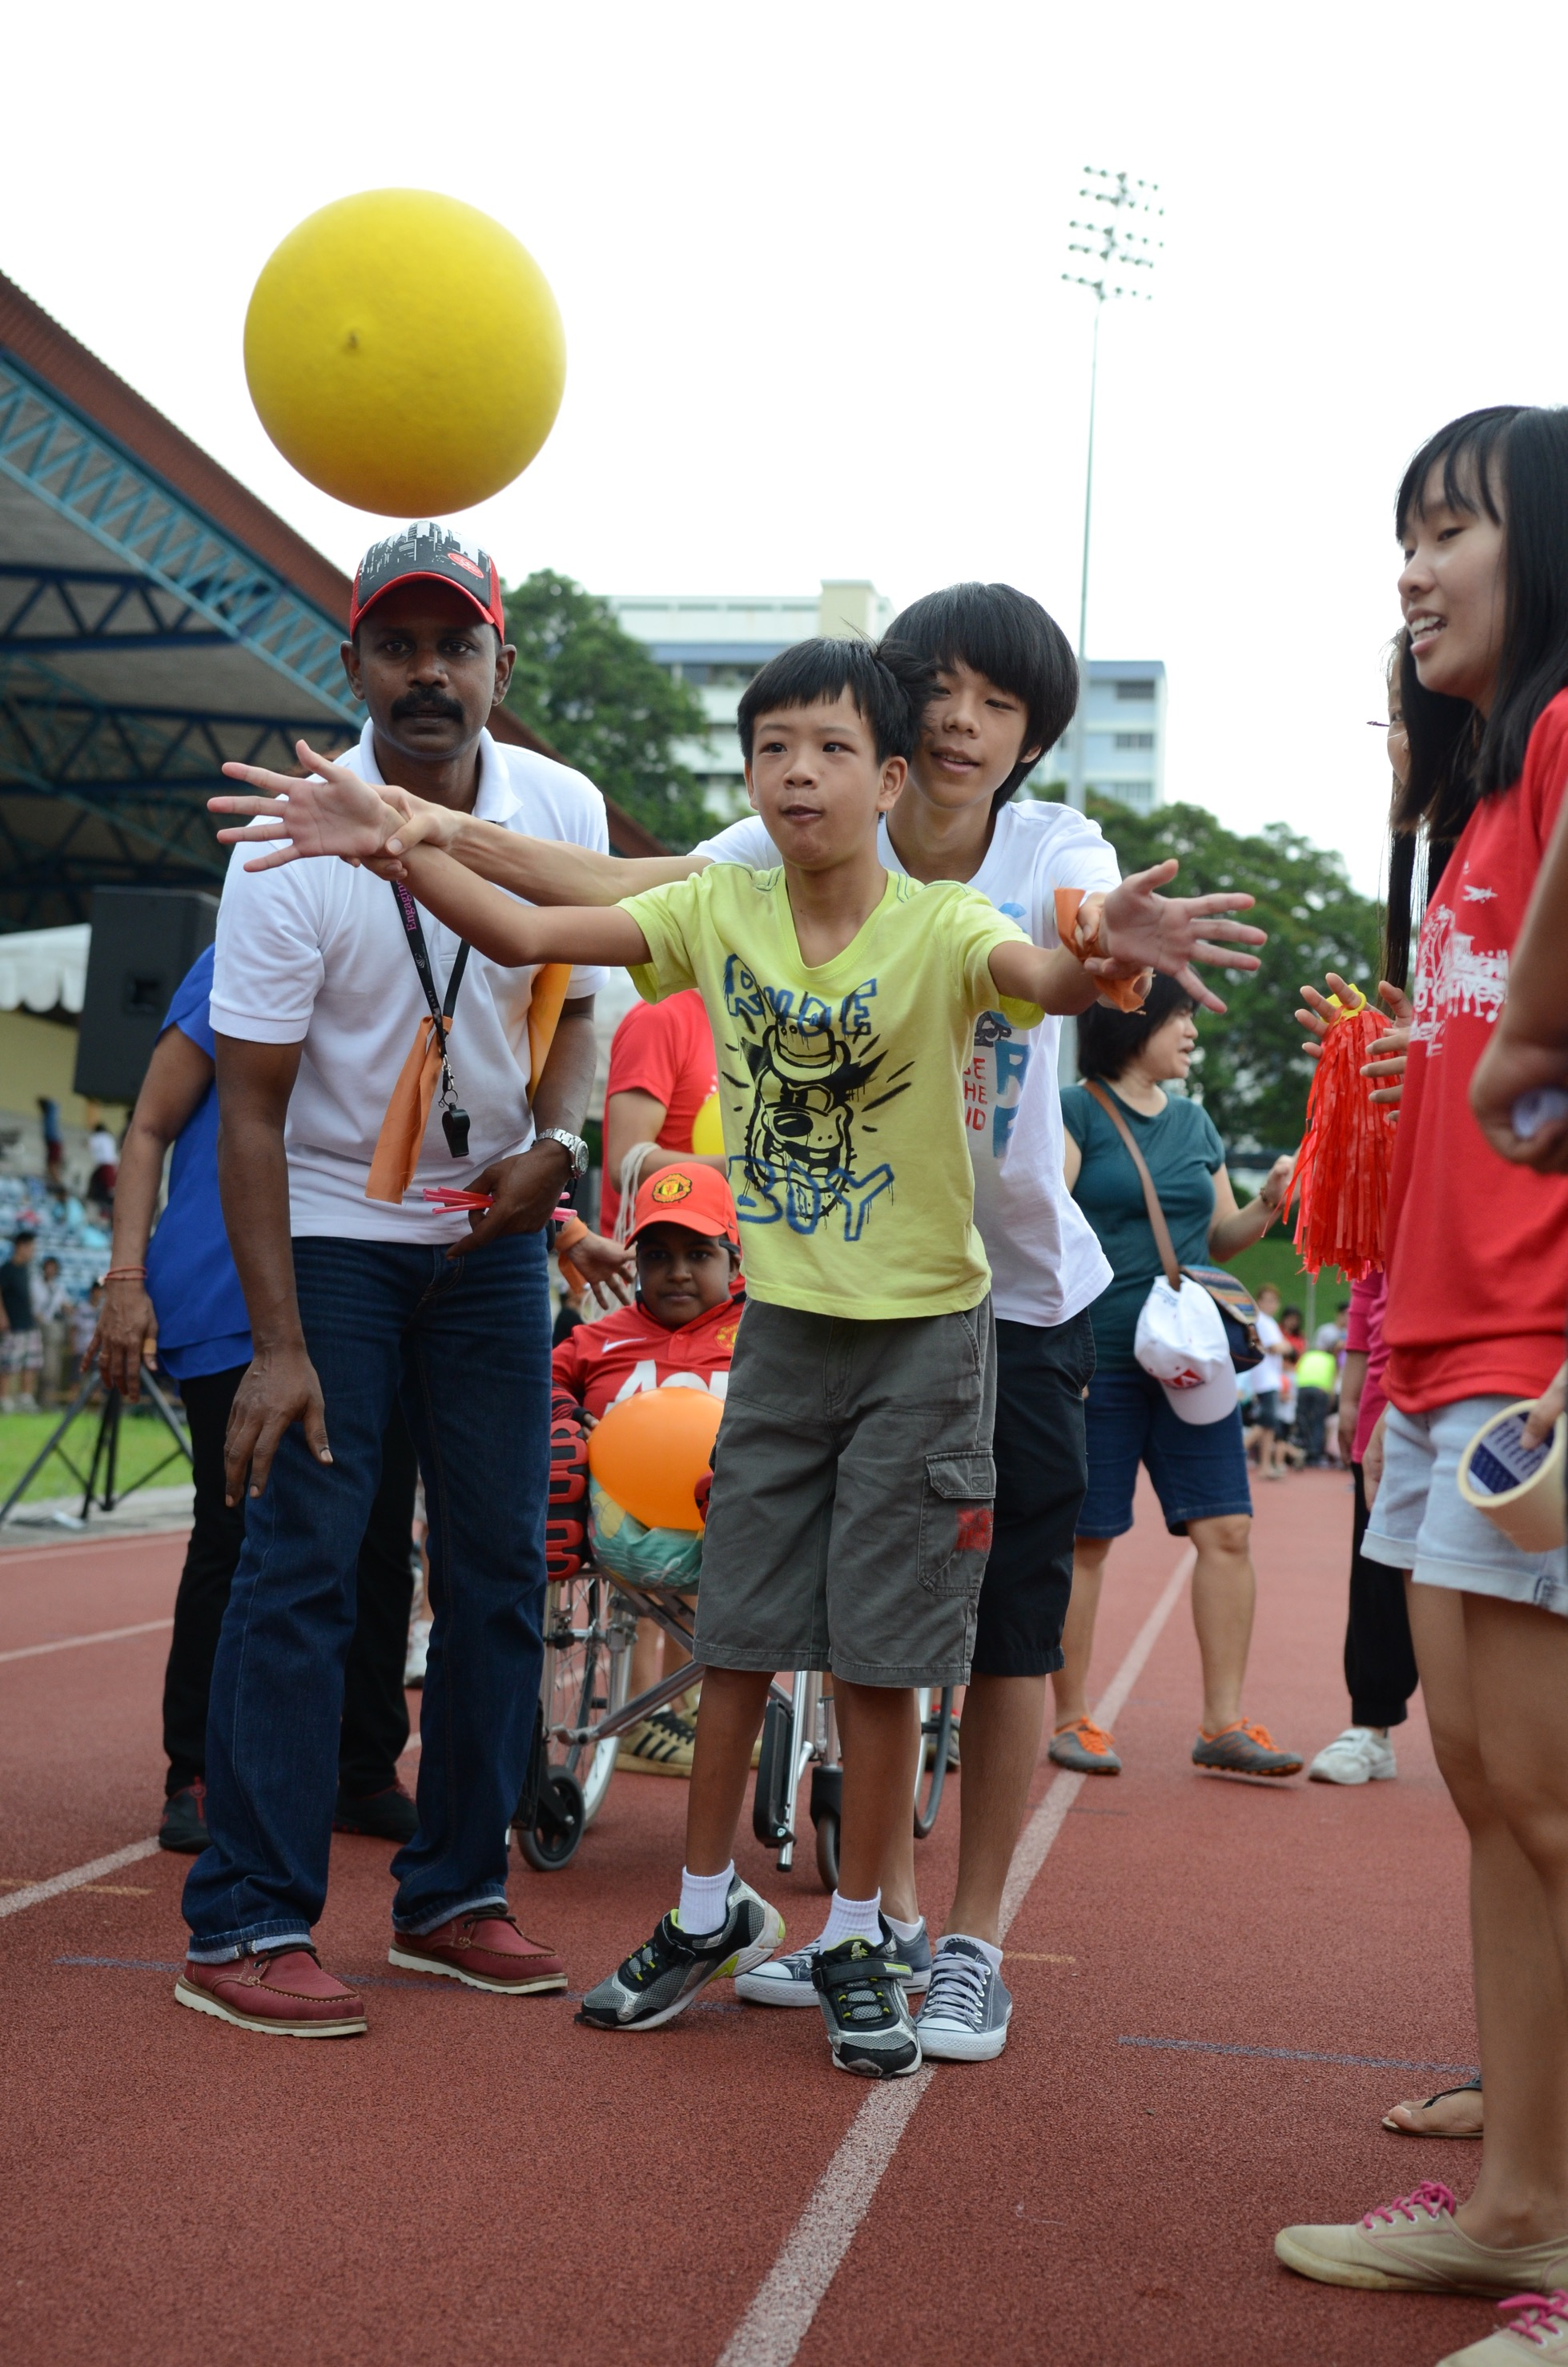 Club Rainbow Singapore Annual Party 2014 -10.JPG